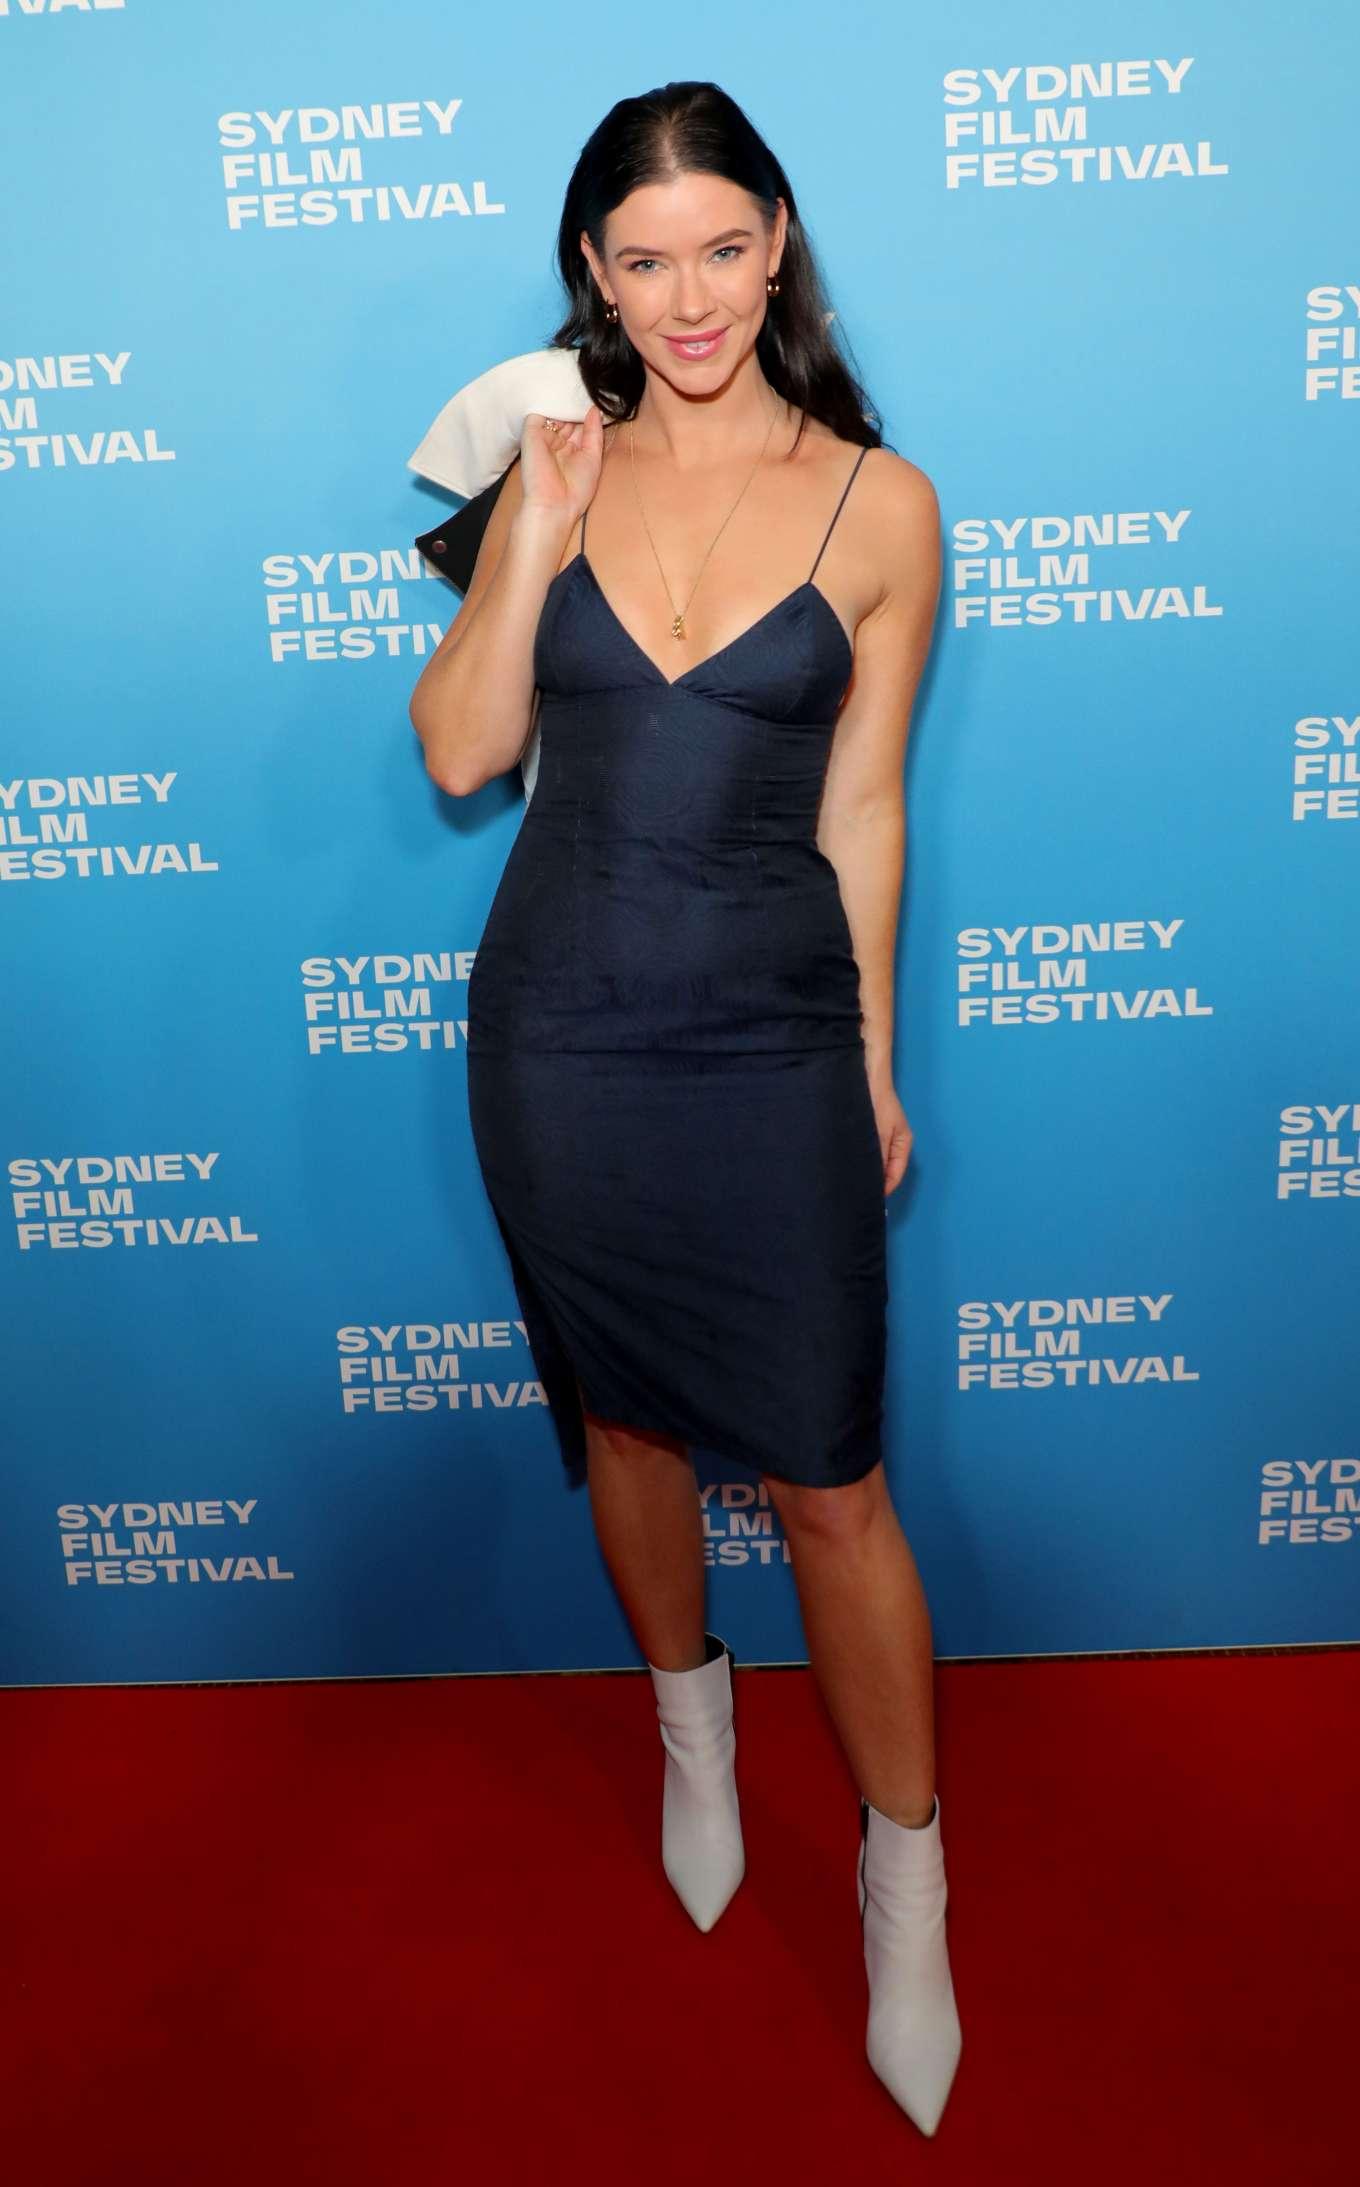 Brittany Hockley - 'Yesterday' Premiere at 66th Sydney Film Festival